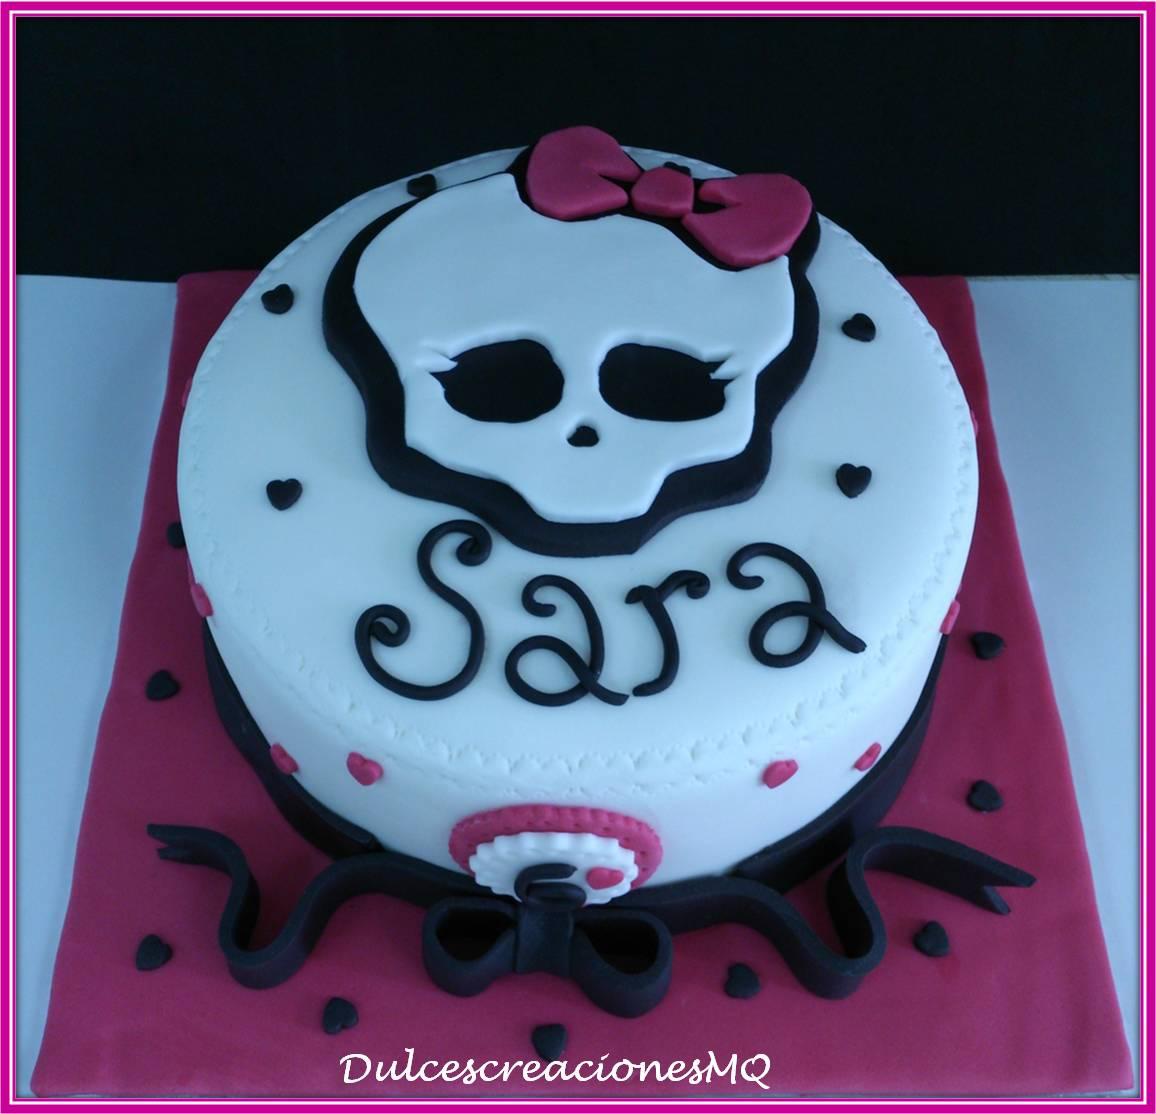 Tarta Pastel Monster High Niña Cumpleaños Aniversario Lazo Negro Fondant Decoración Bizcocho